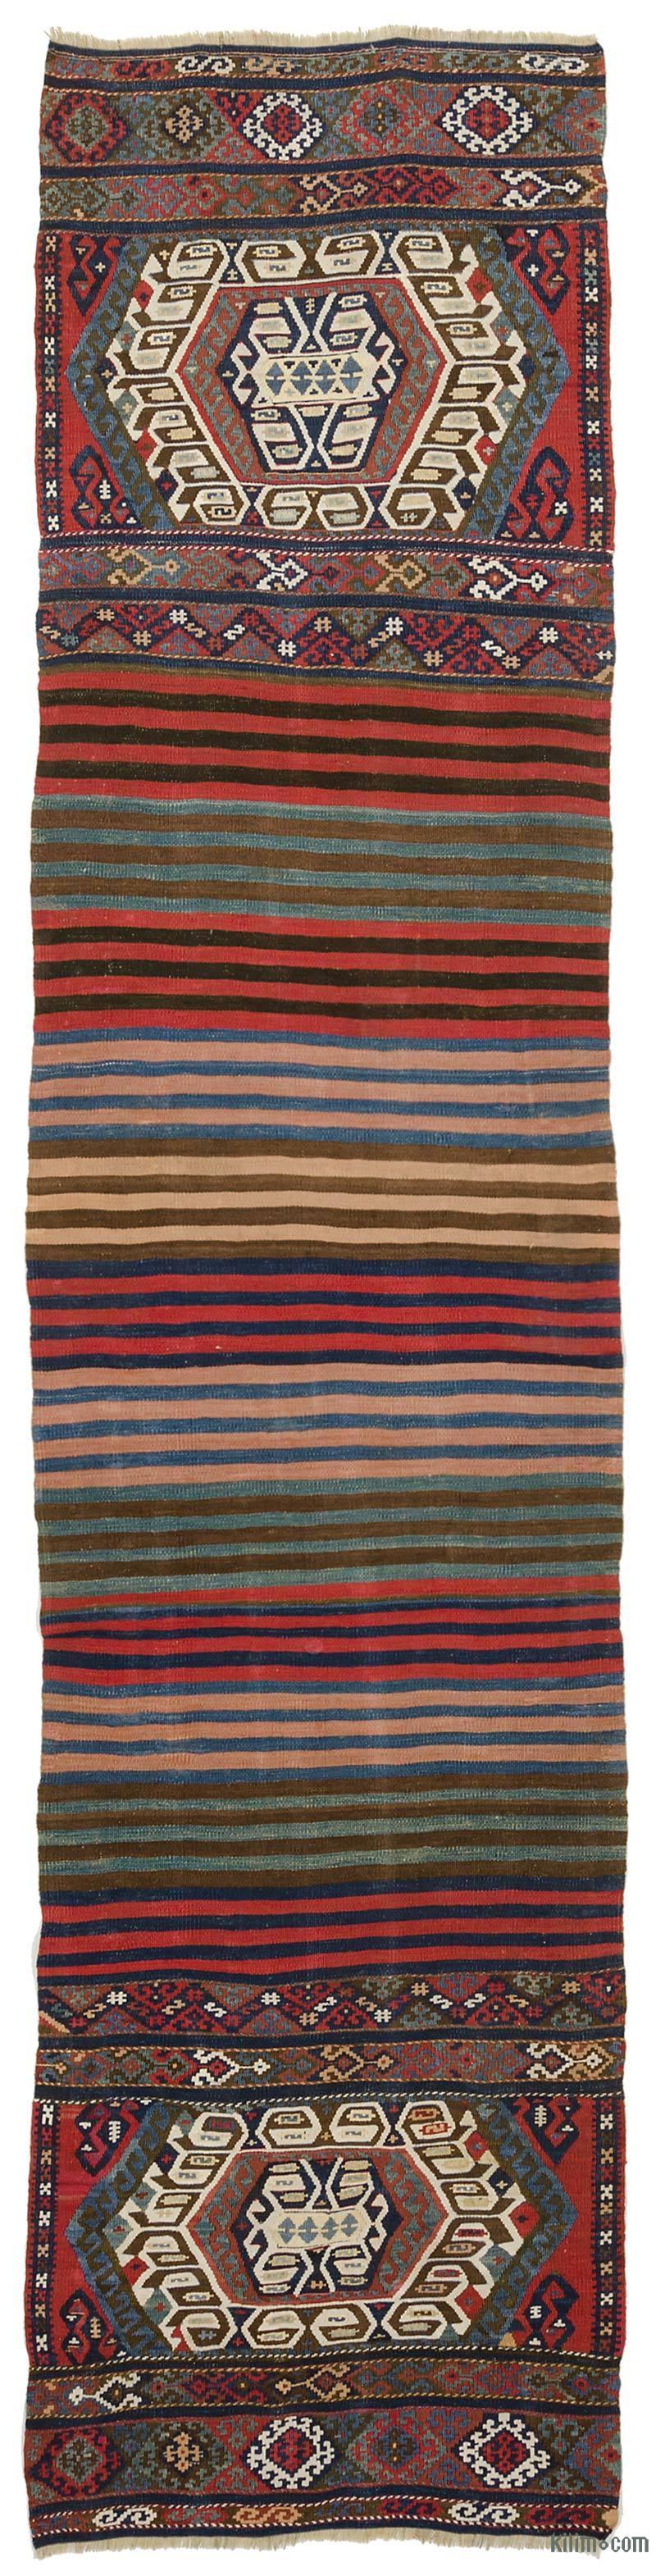 Multicolor Corredor Antiguo Malatya Kilim - 74 cm x 305 cm - K0006236